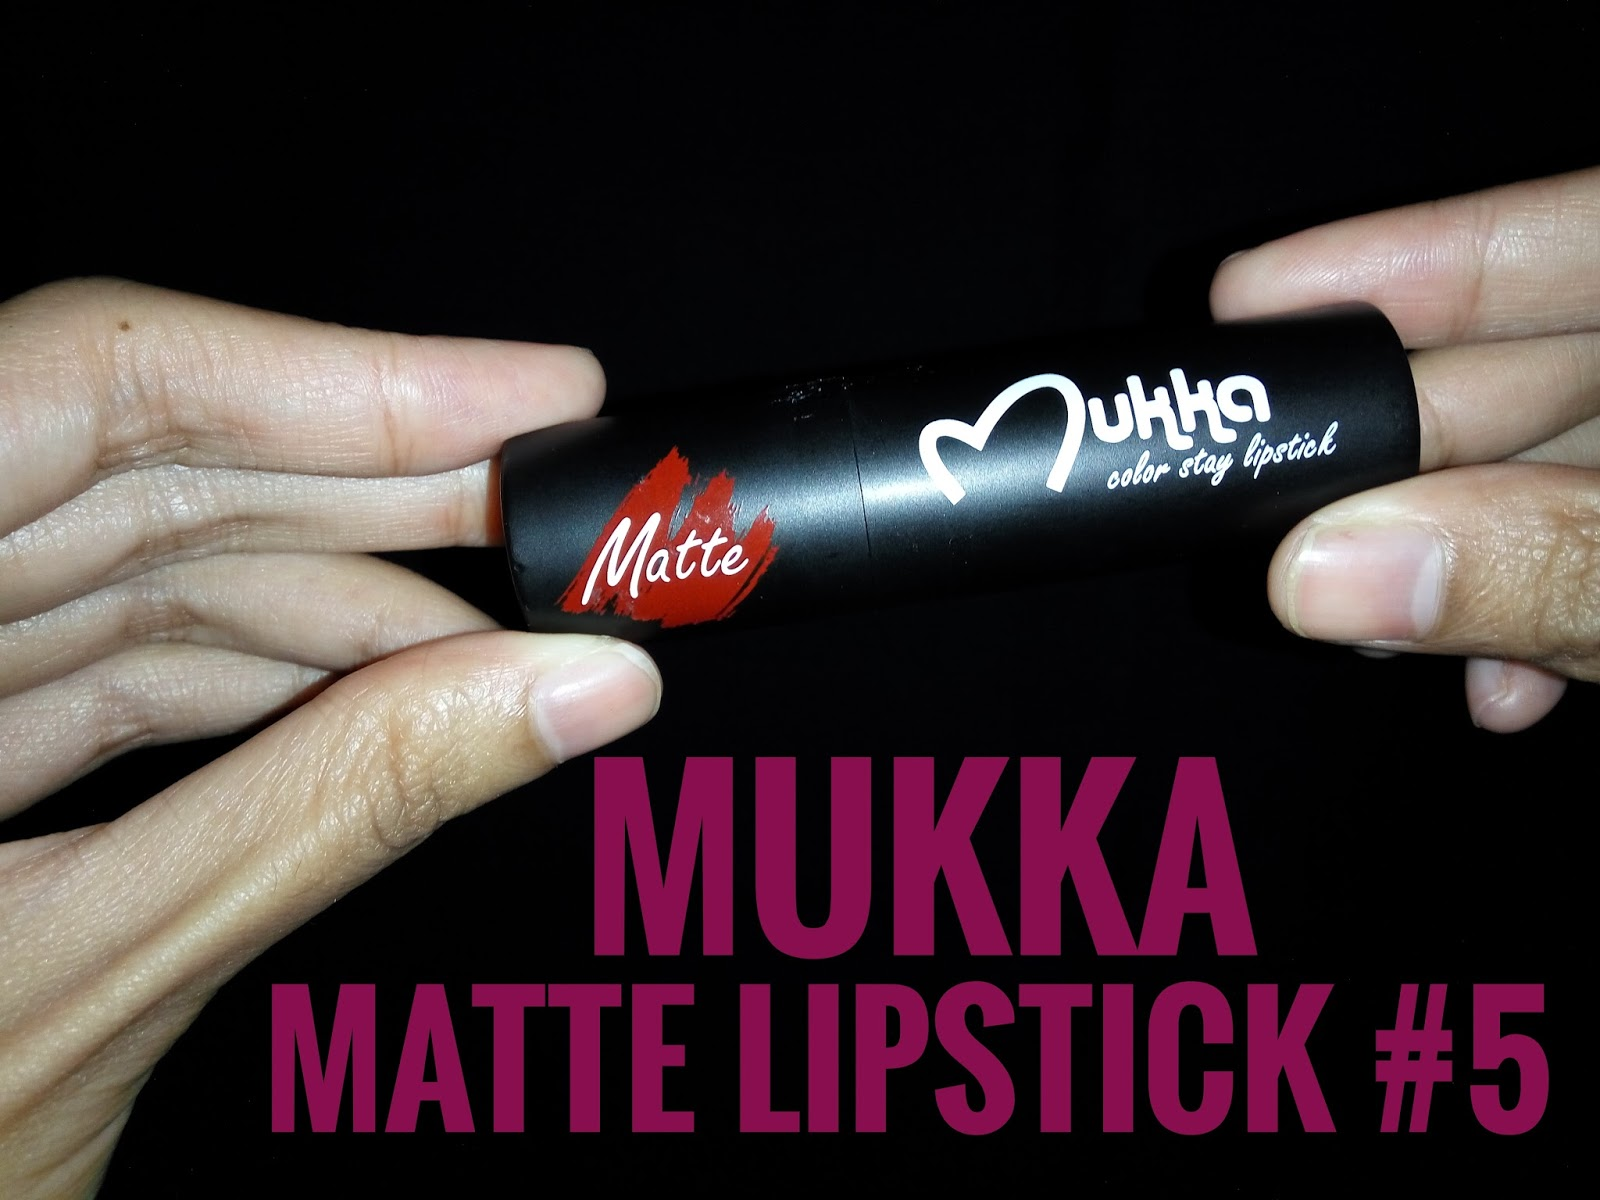 Review Mukka Matte Lipstck #5 - DaretoChange by Indonesian